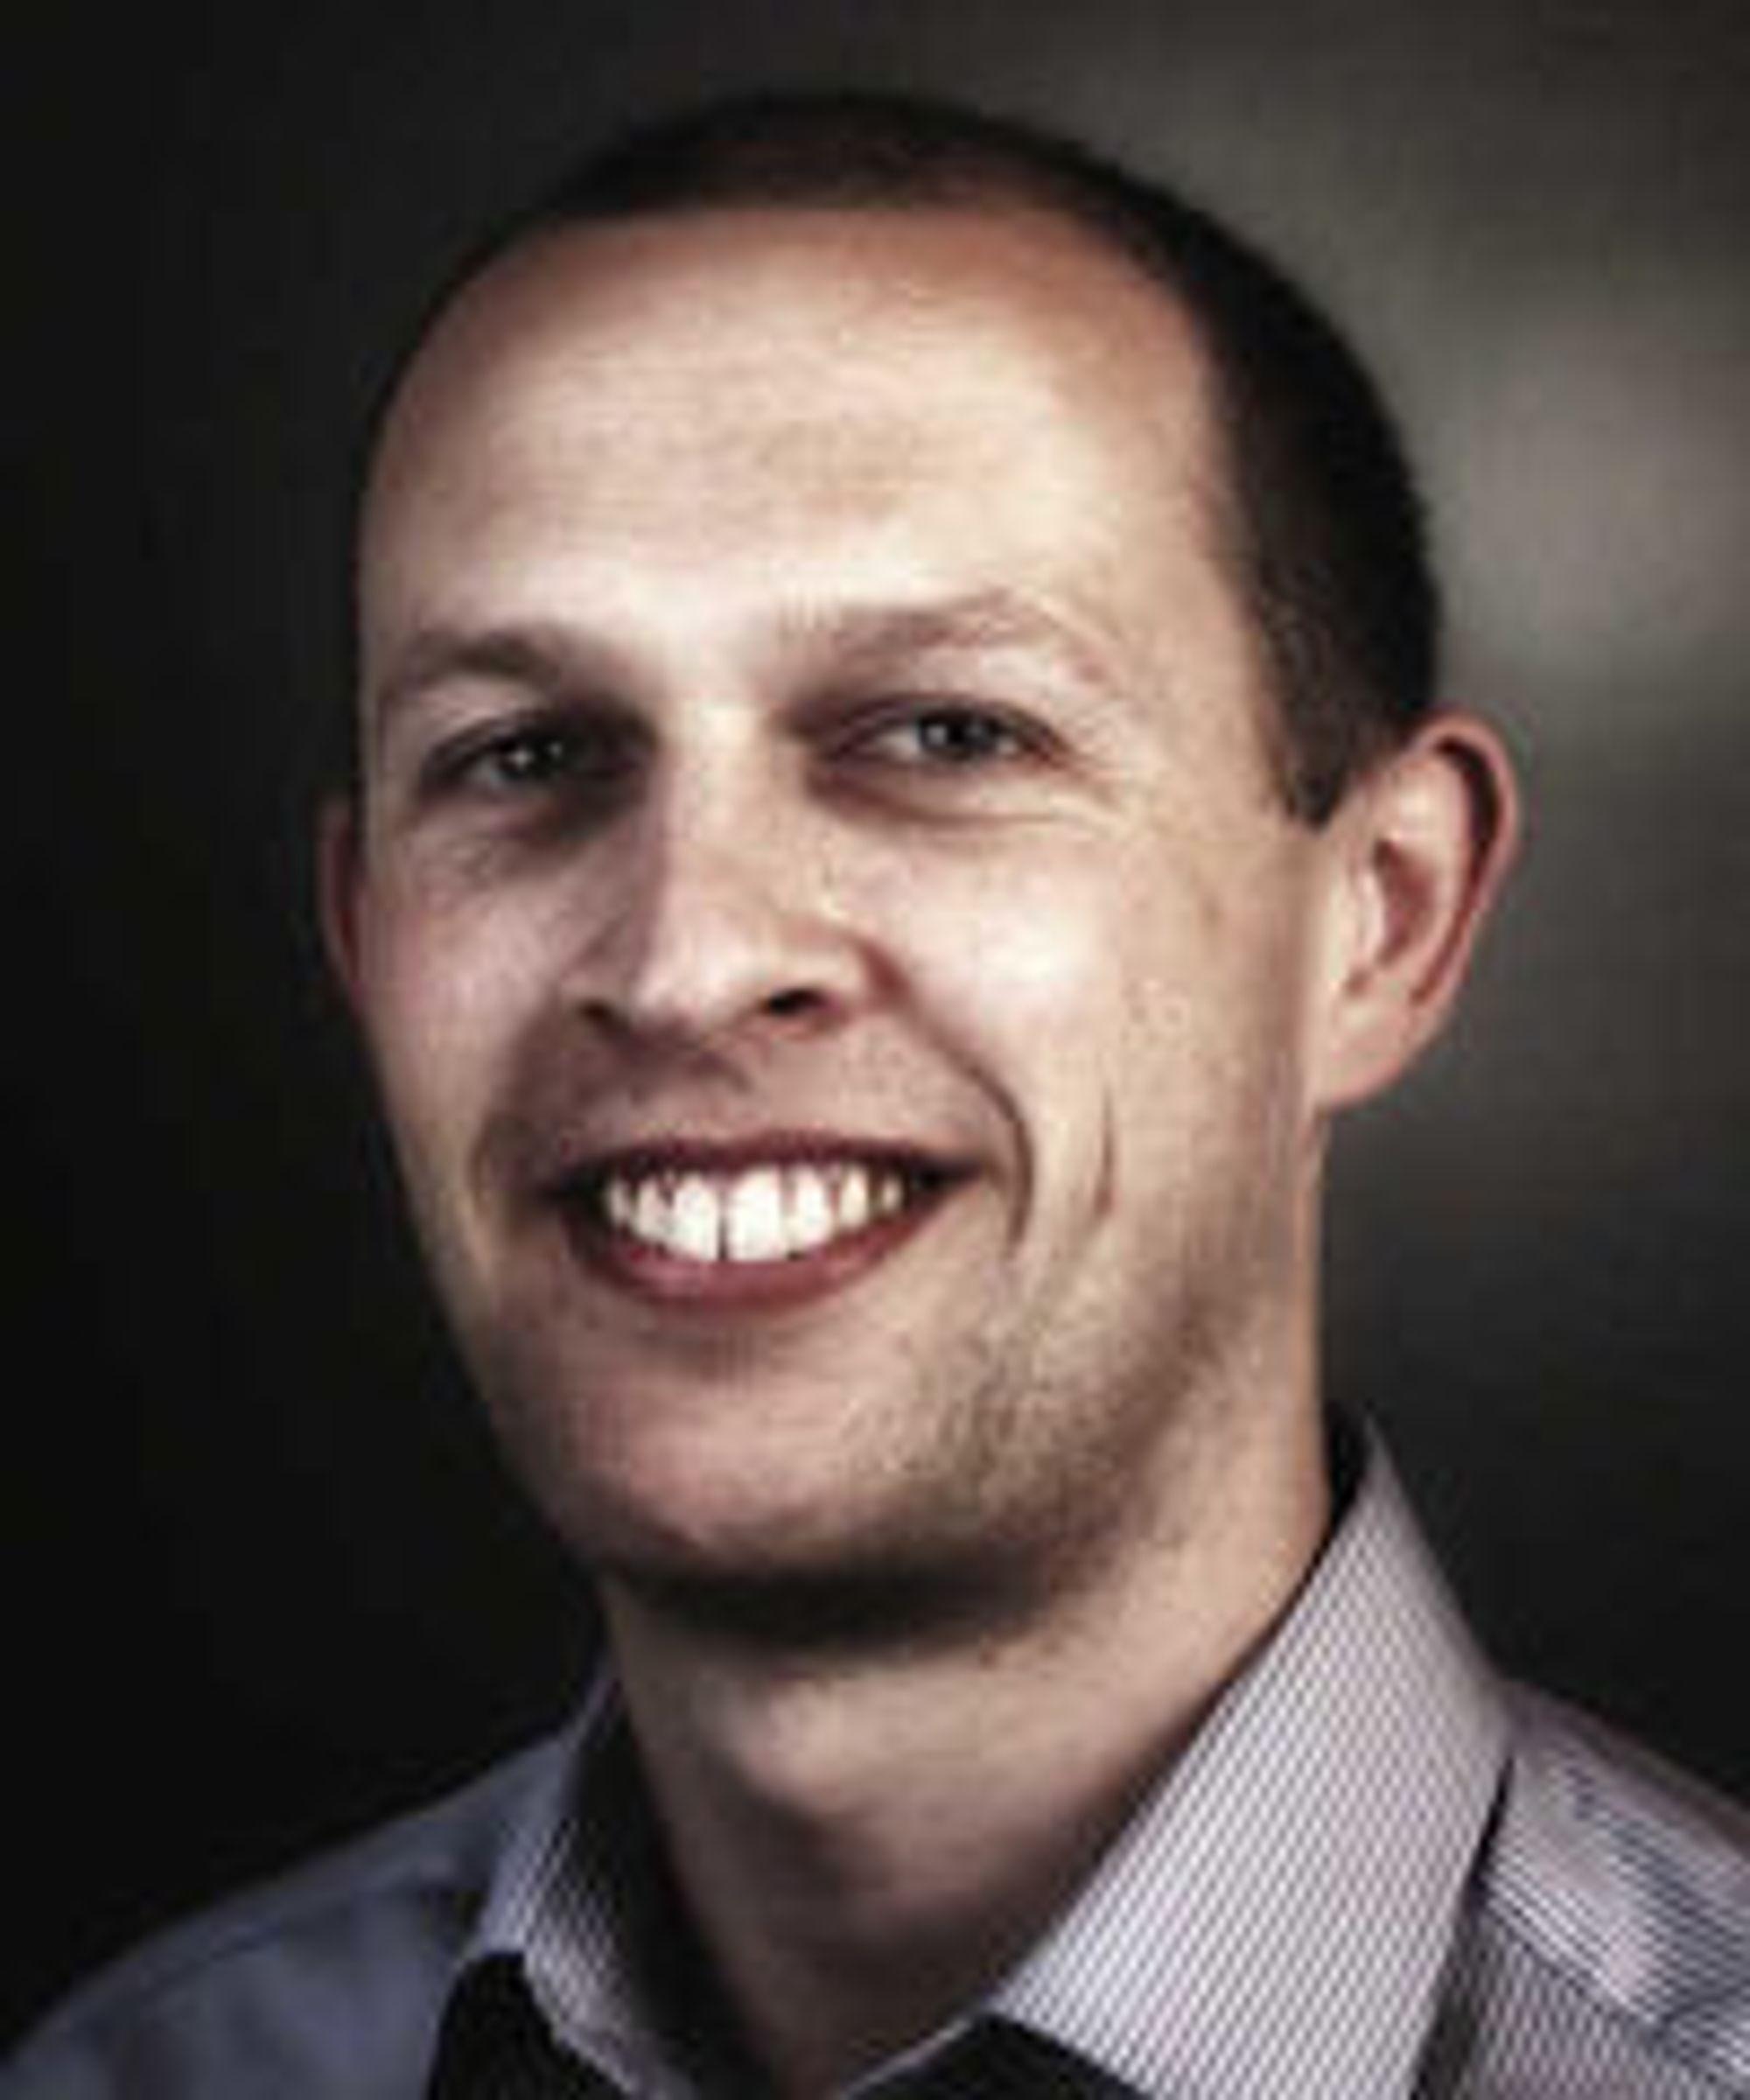 Kristian Madsen, administrerende direktør i Bookboon.com